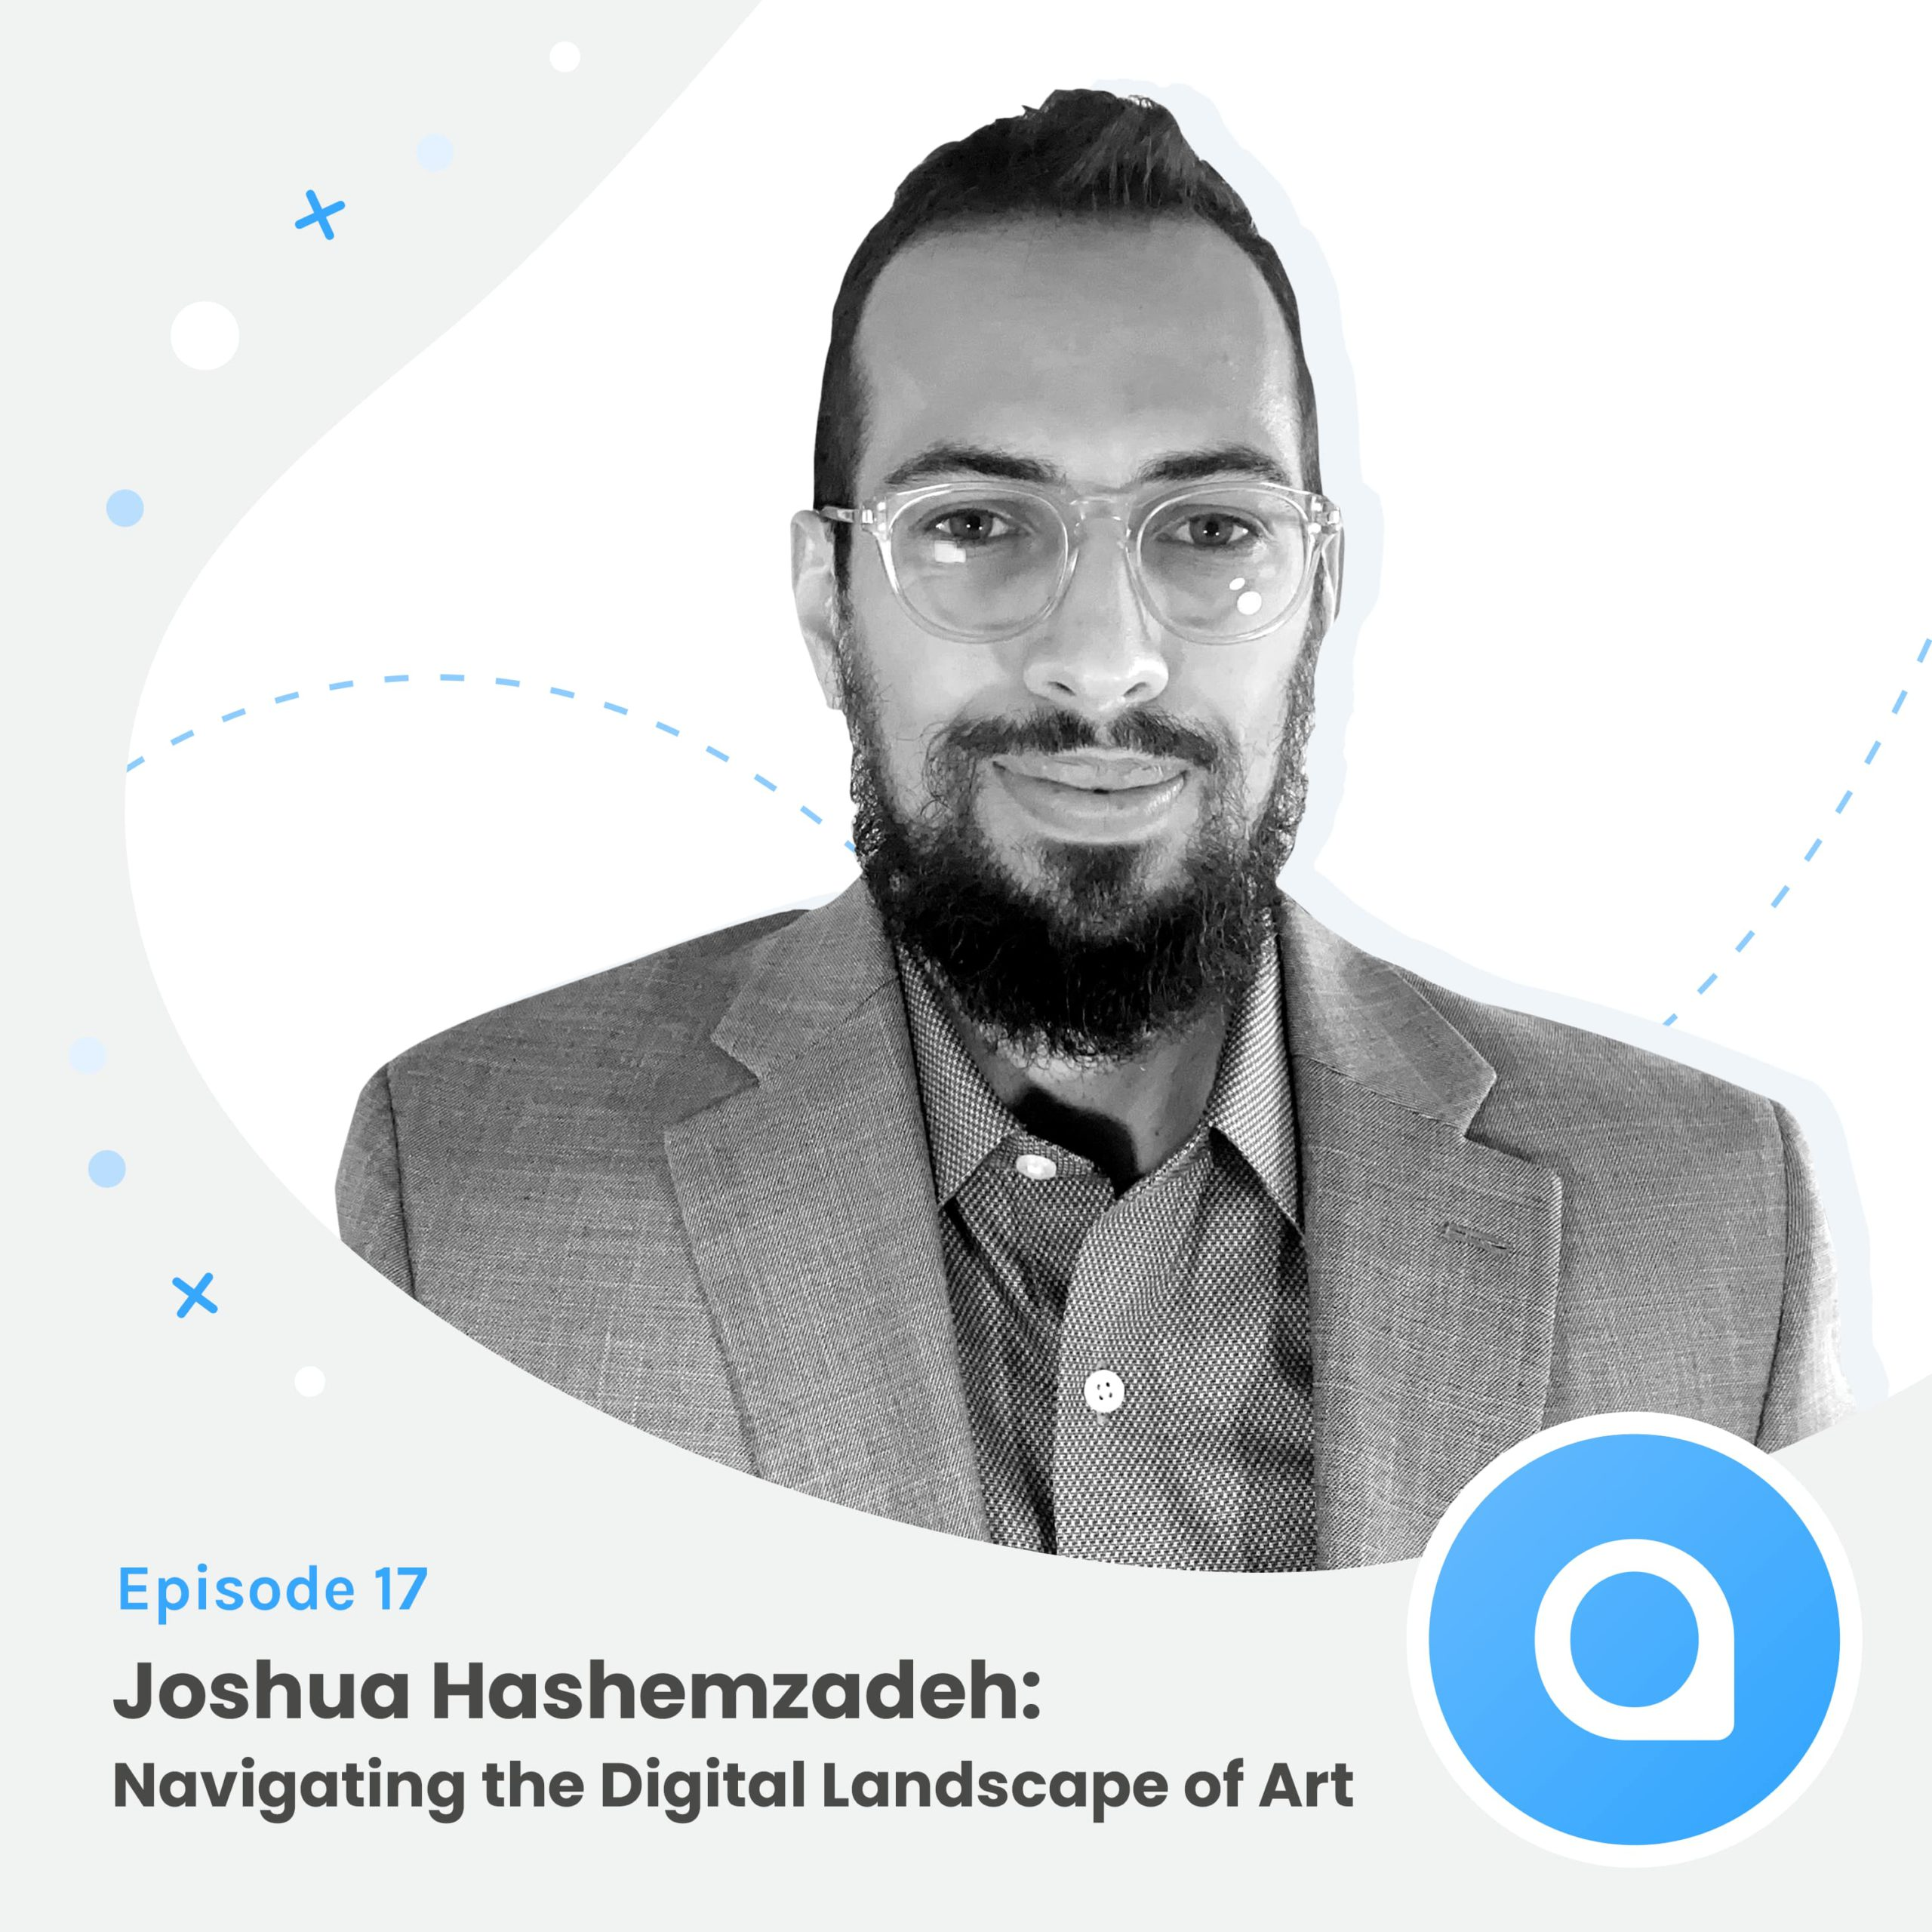 Joshua Hashemzadeh: Navigating the Digital Landscape of Art